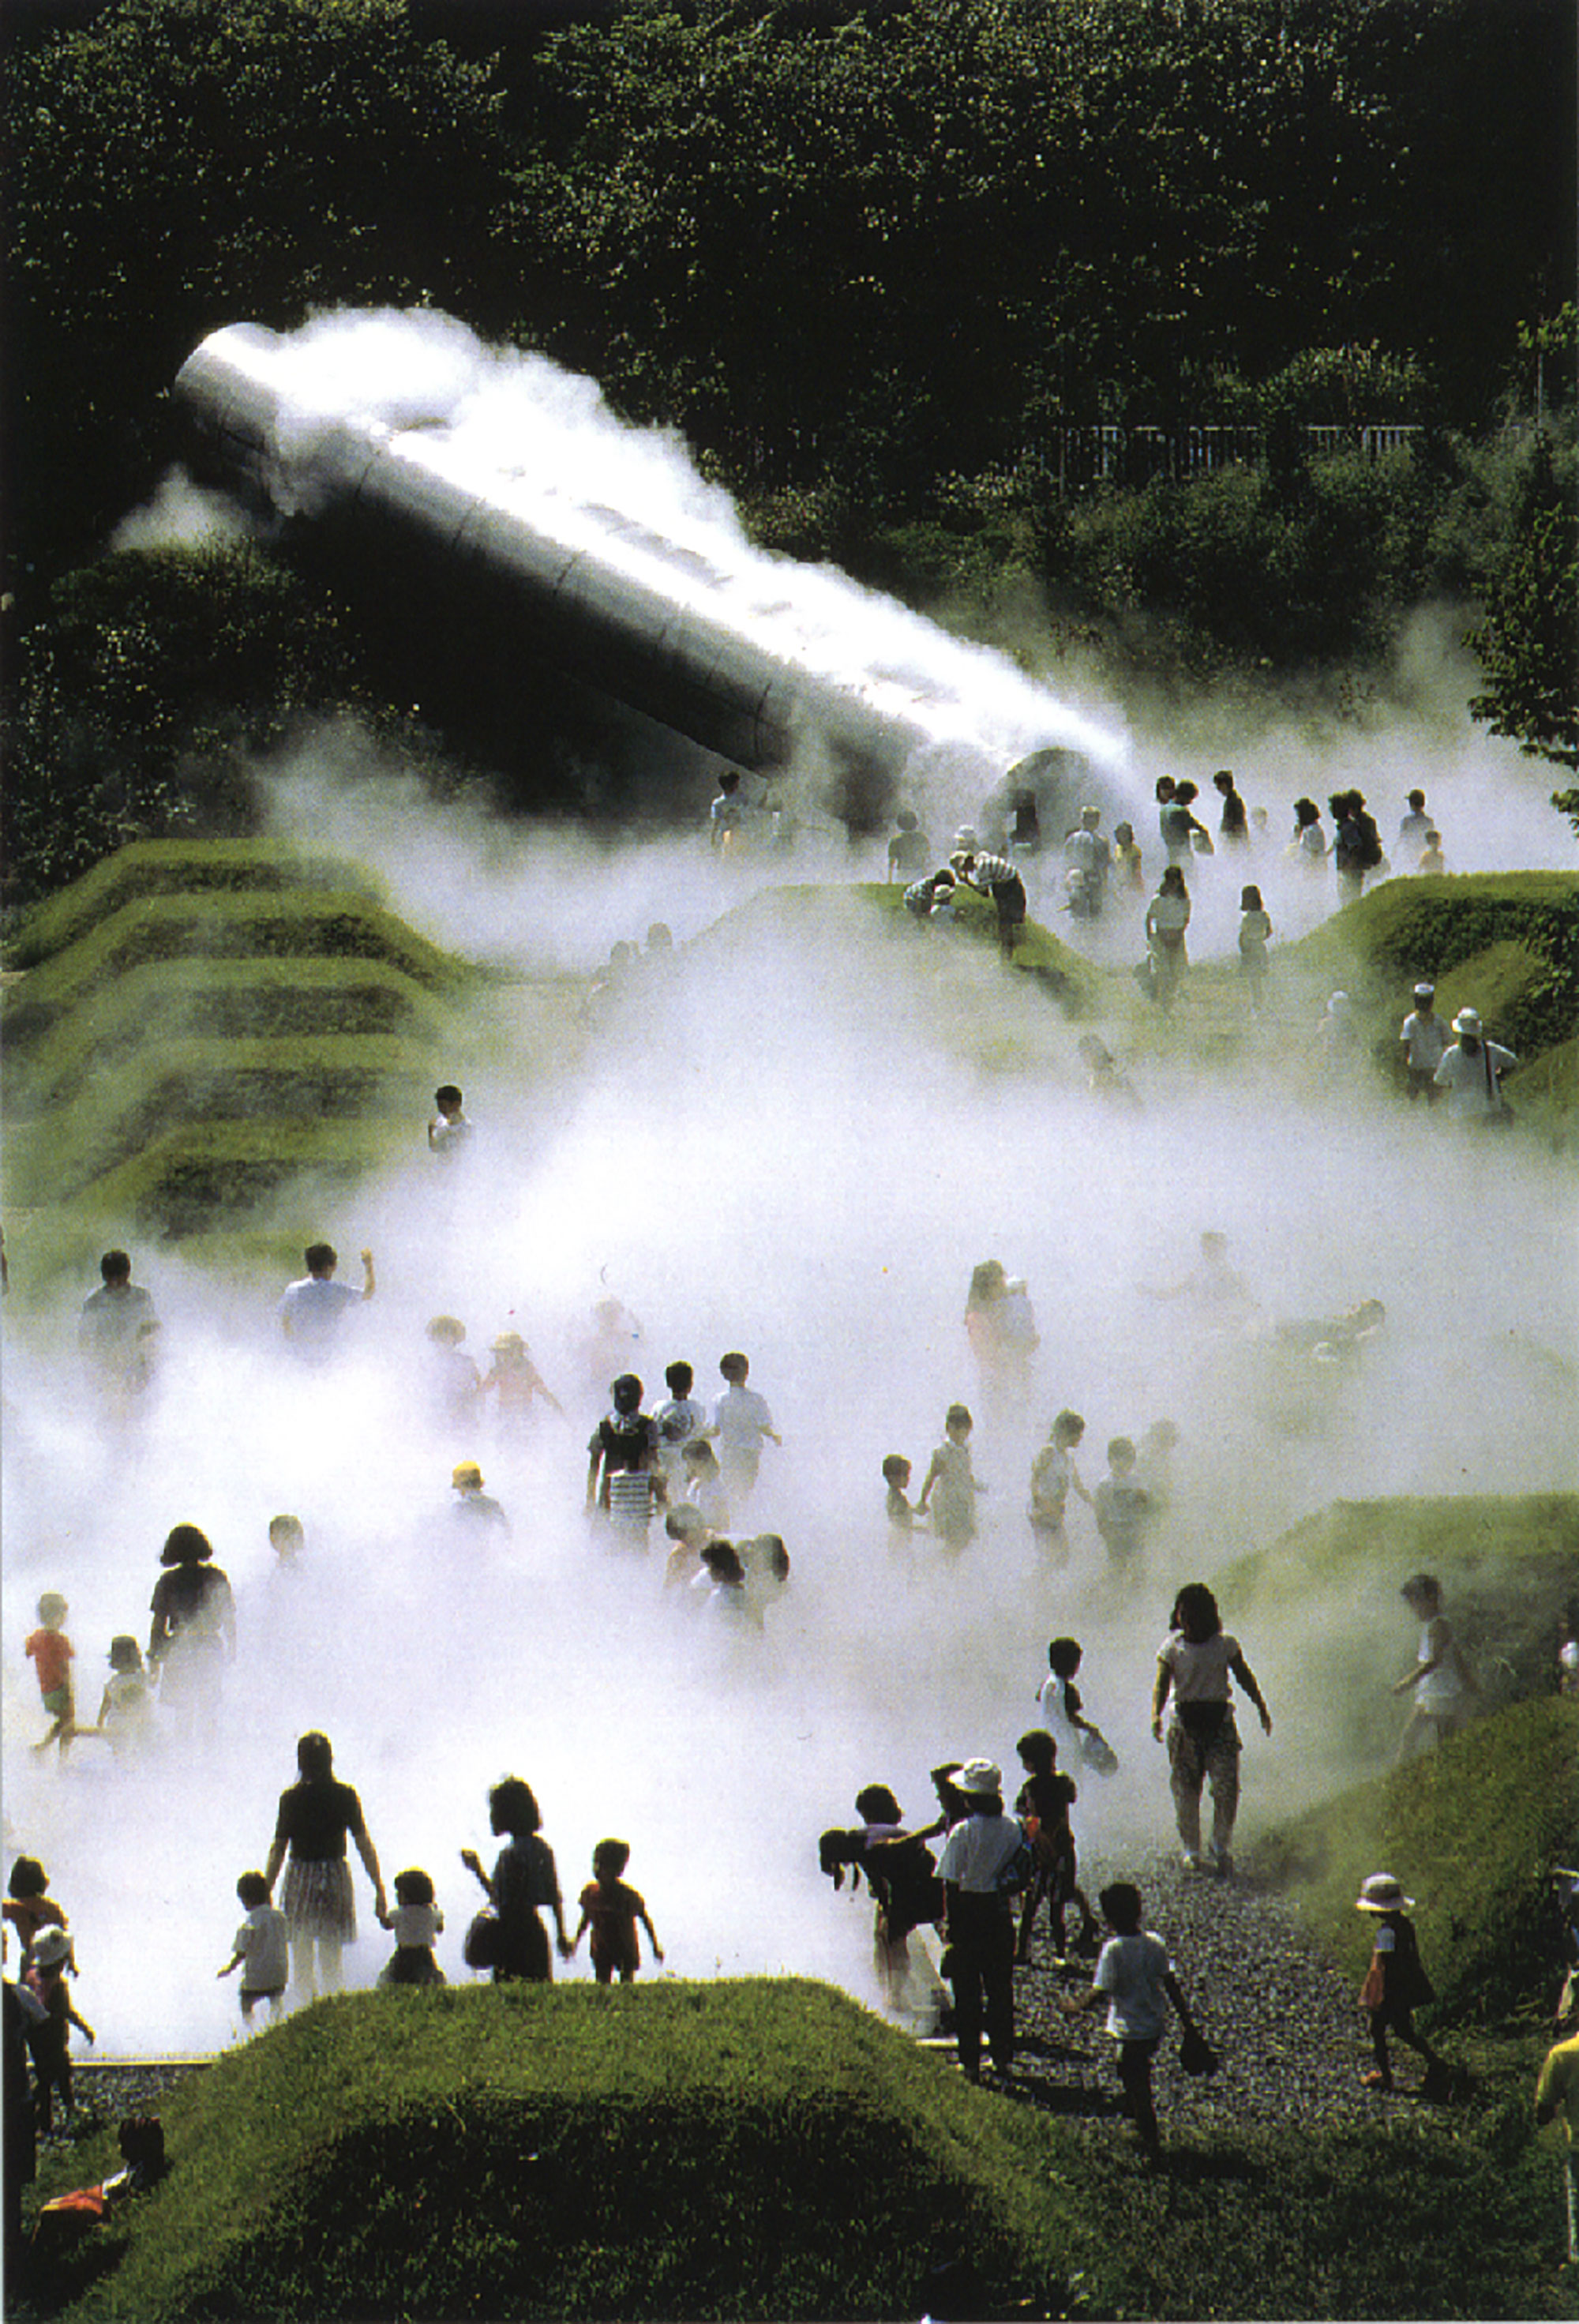 Foggy Forest | 1992 | Showa Kinen Park, Tachikawa, Japan (Permanent Installation) ©︎ Shigeo Ogawa